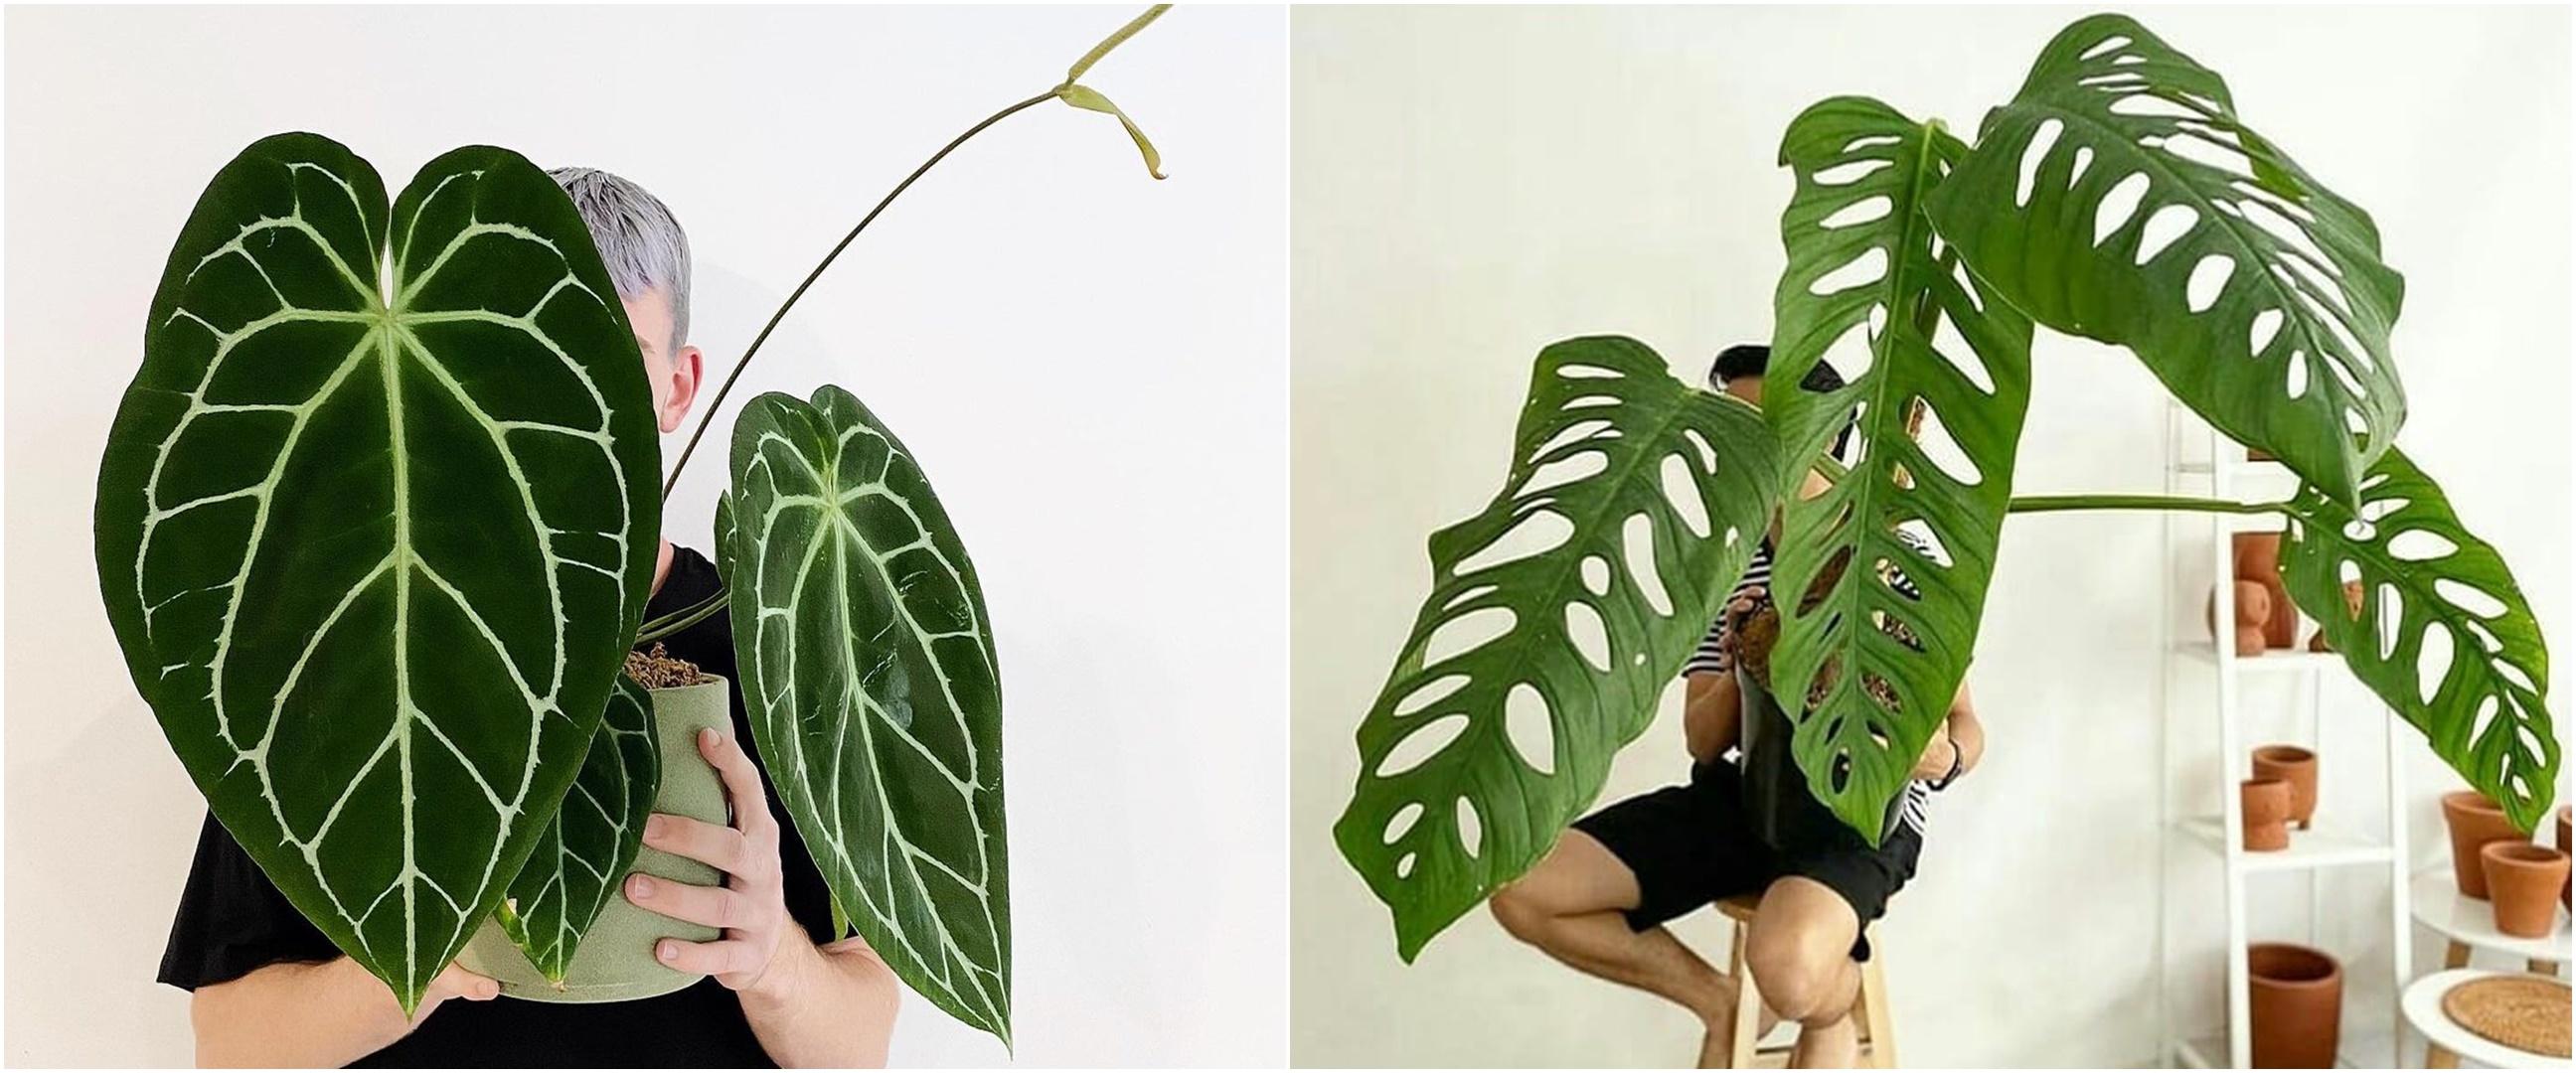 15 Jenis tanaman hias daun, beri efek segar di luar dan dalam rumah